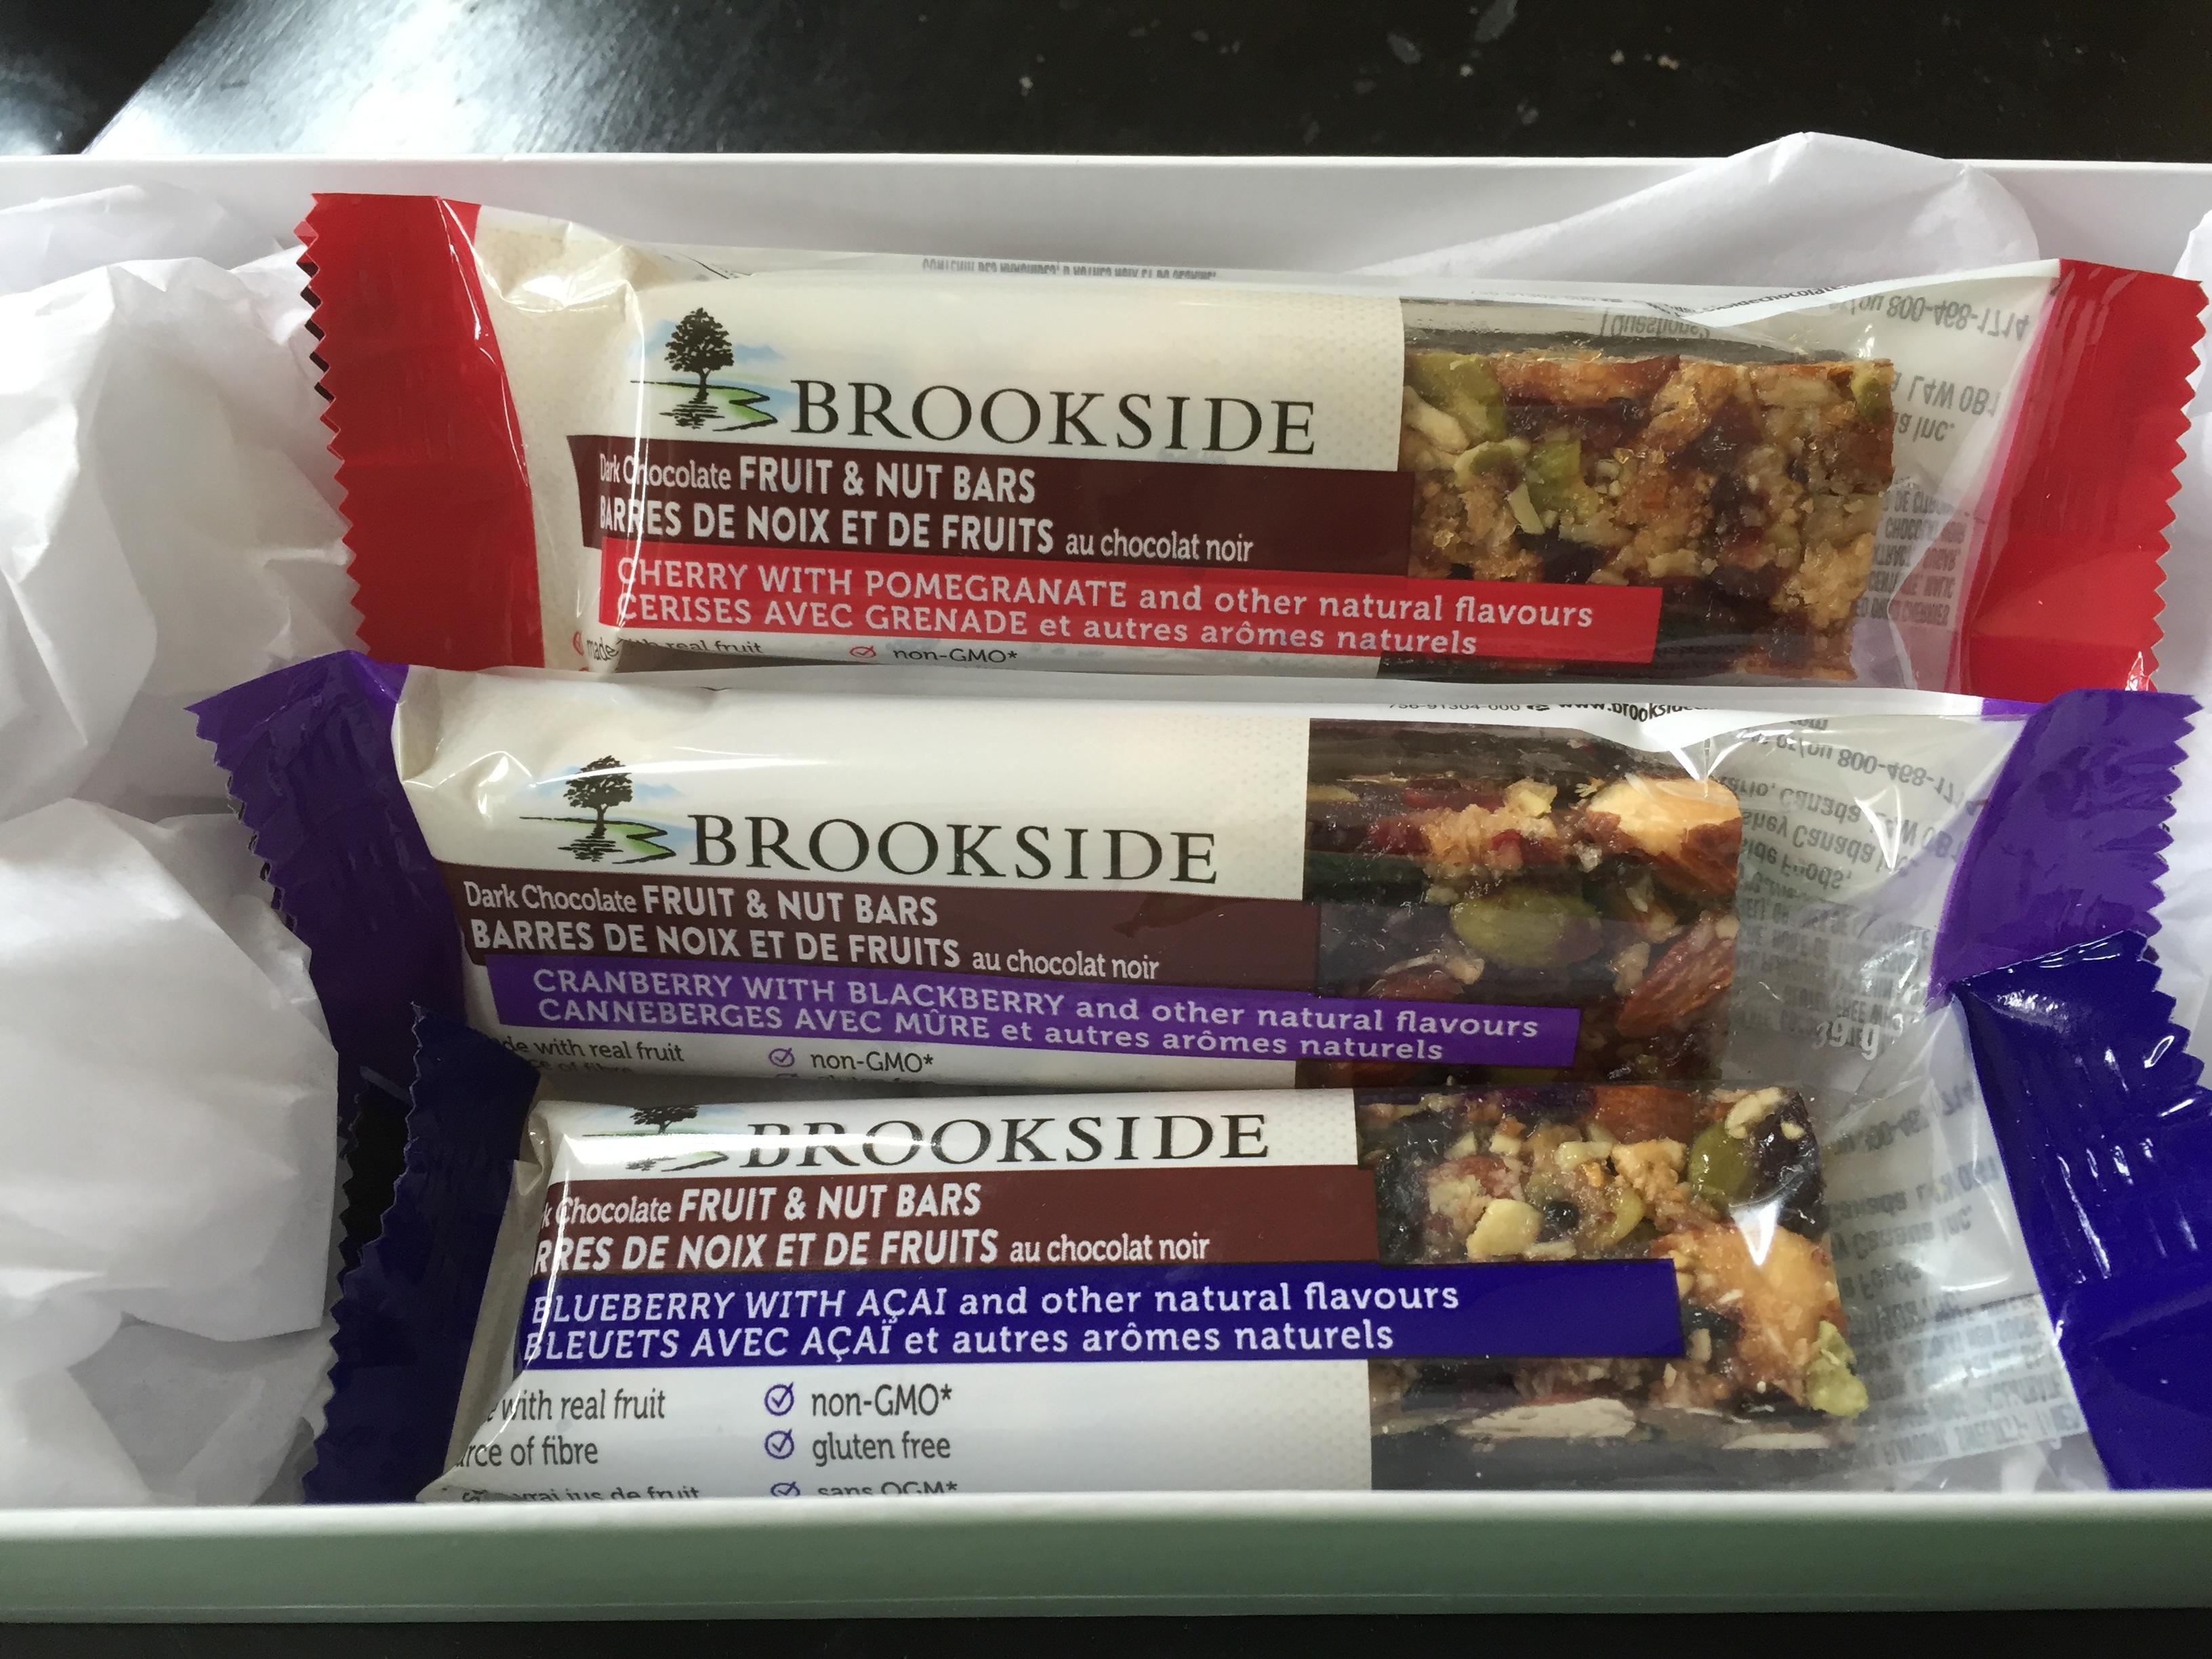 Brookside Dark Chocolate Fruit & Nut Bars - Blueberry with Acai ...